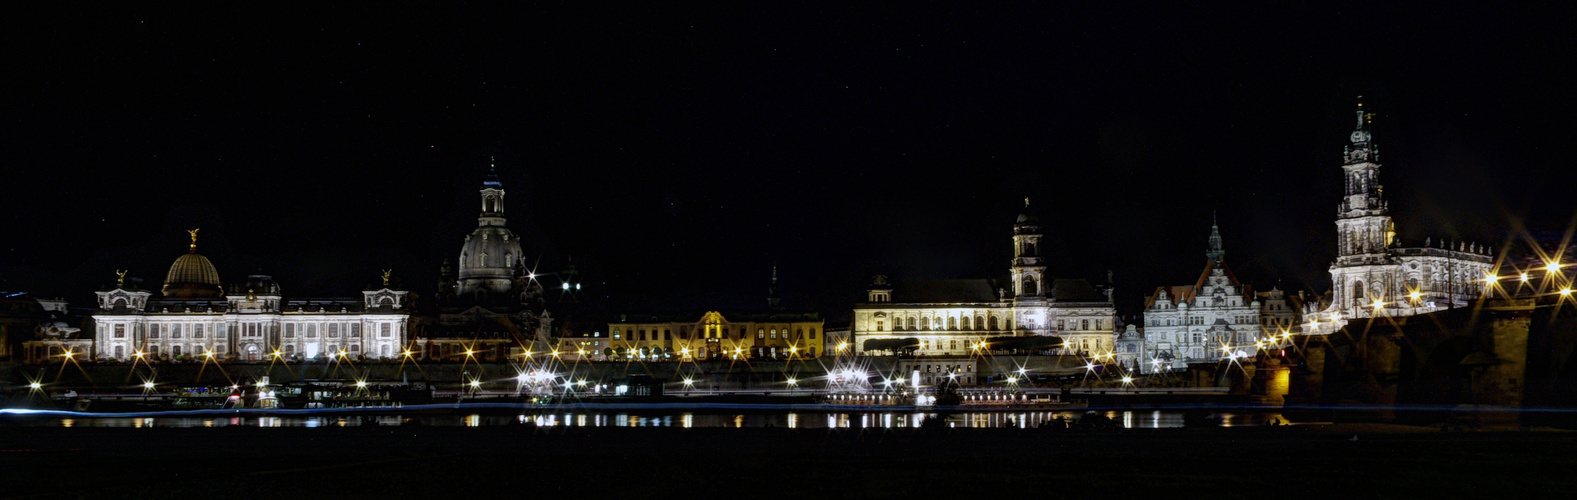 Canaletto-Blick bei Nacht